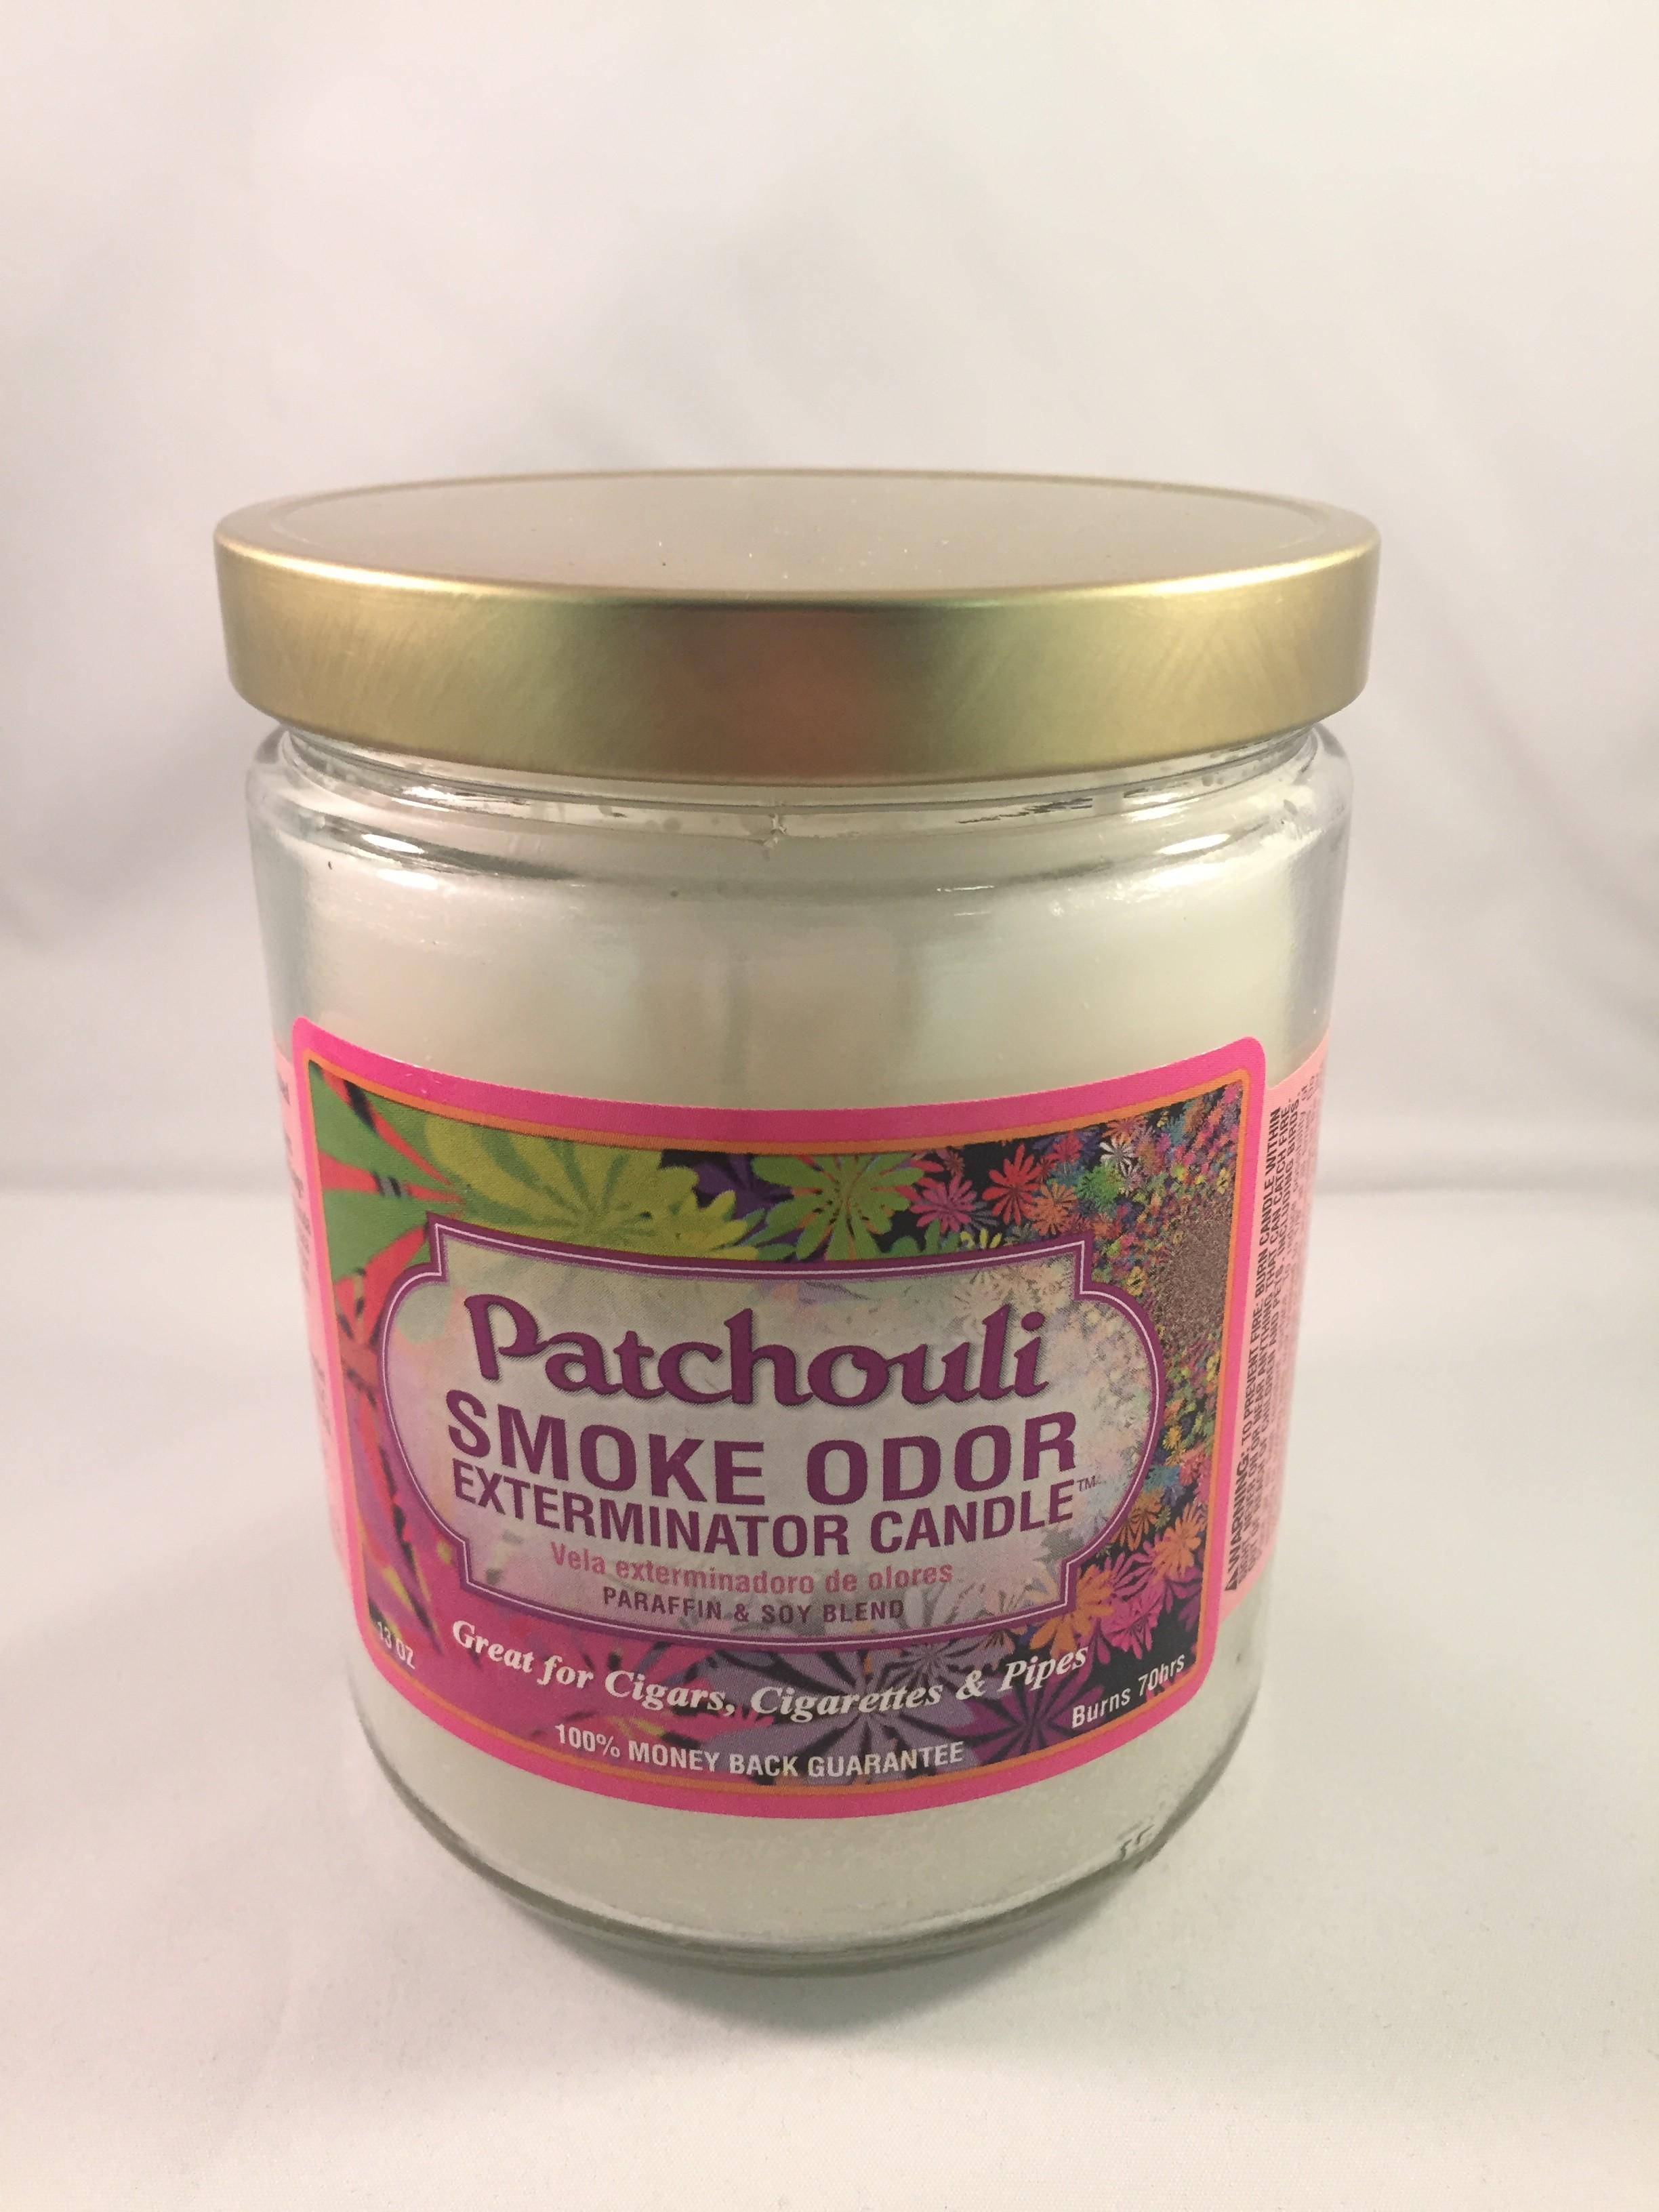 Smoke Odor Exterminator Candle - Patchouli